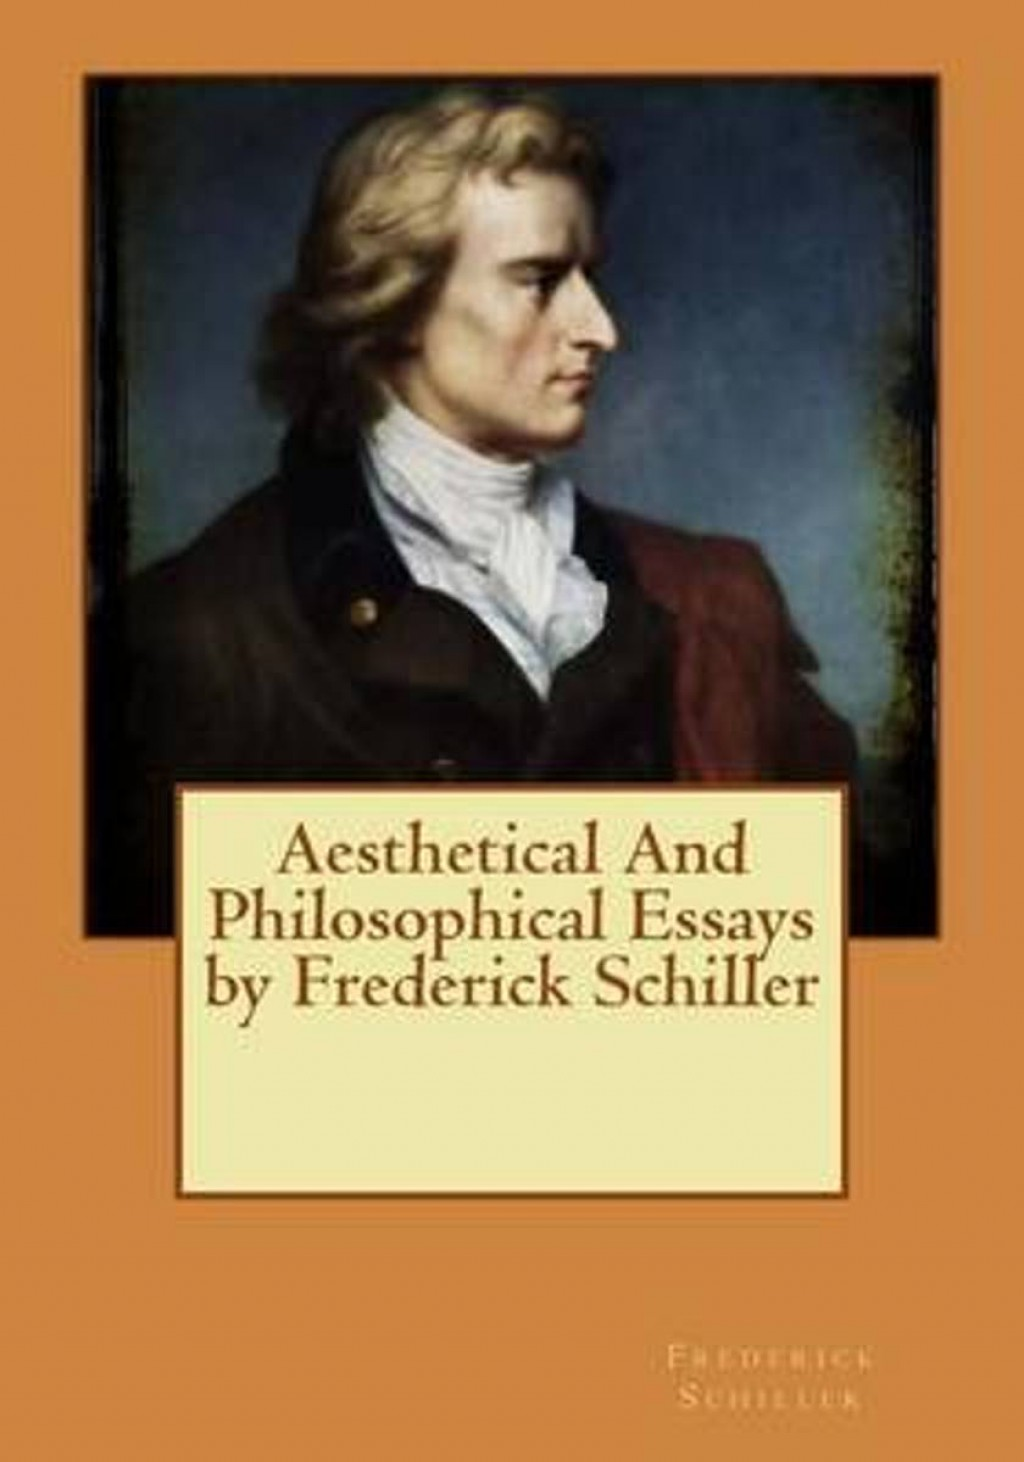 011 Essay Example Schiller Awful Essays Friedrich Large